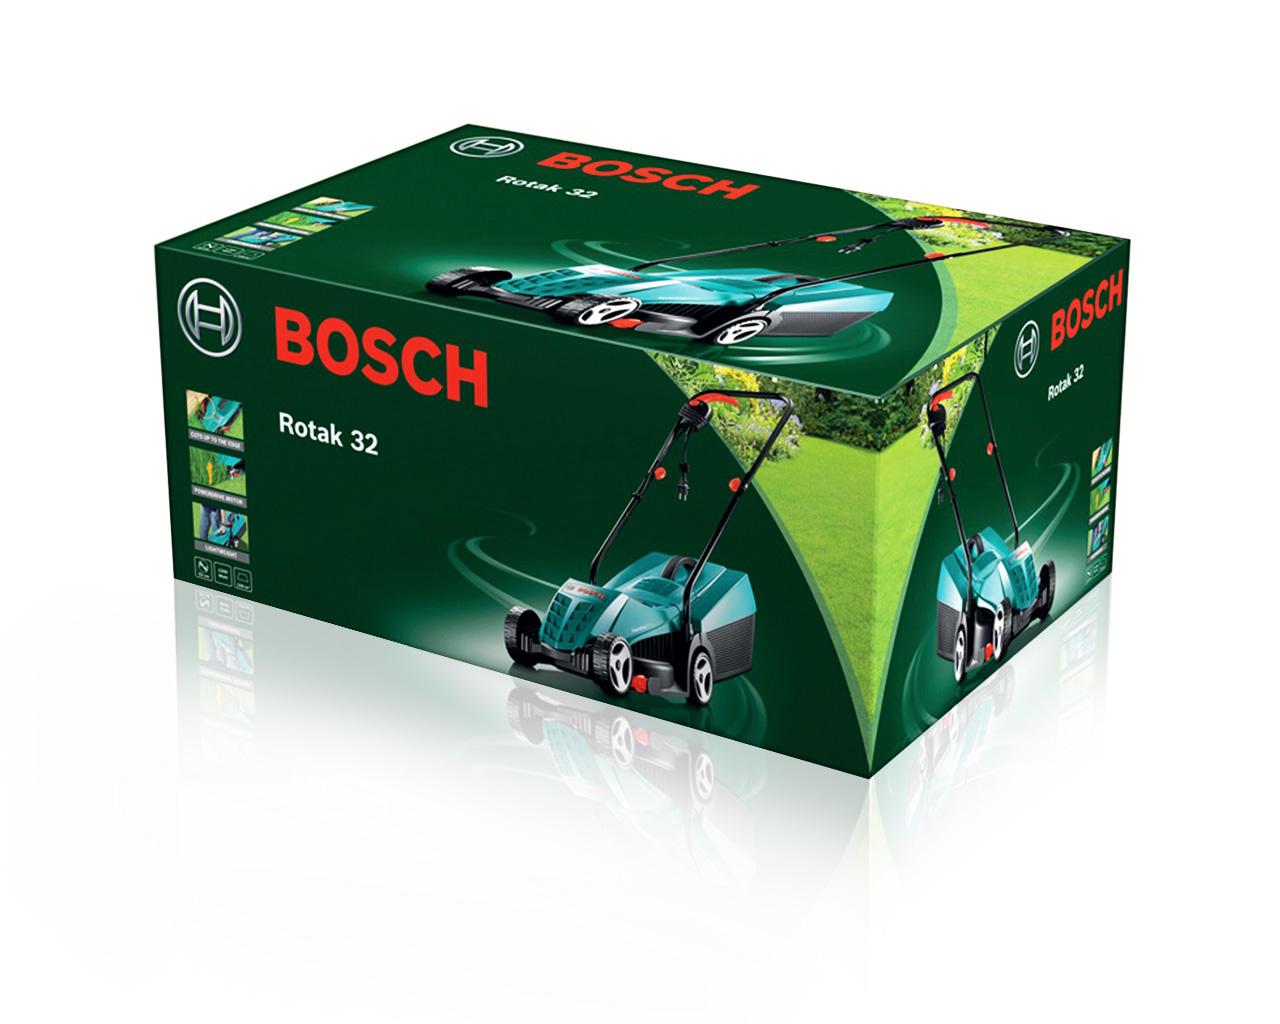 BOSCH-CHOSEN-OPTION-(no-old-pack)